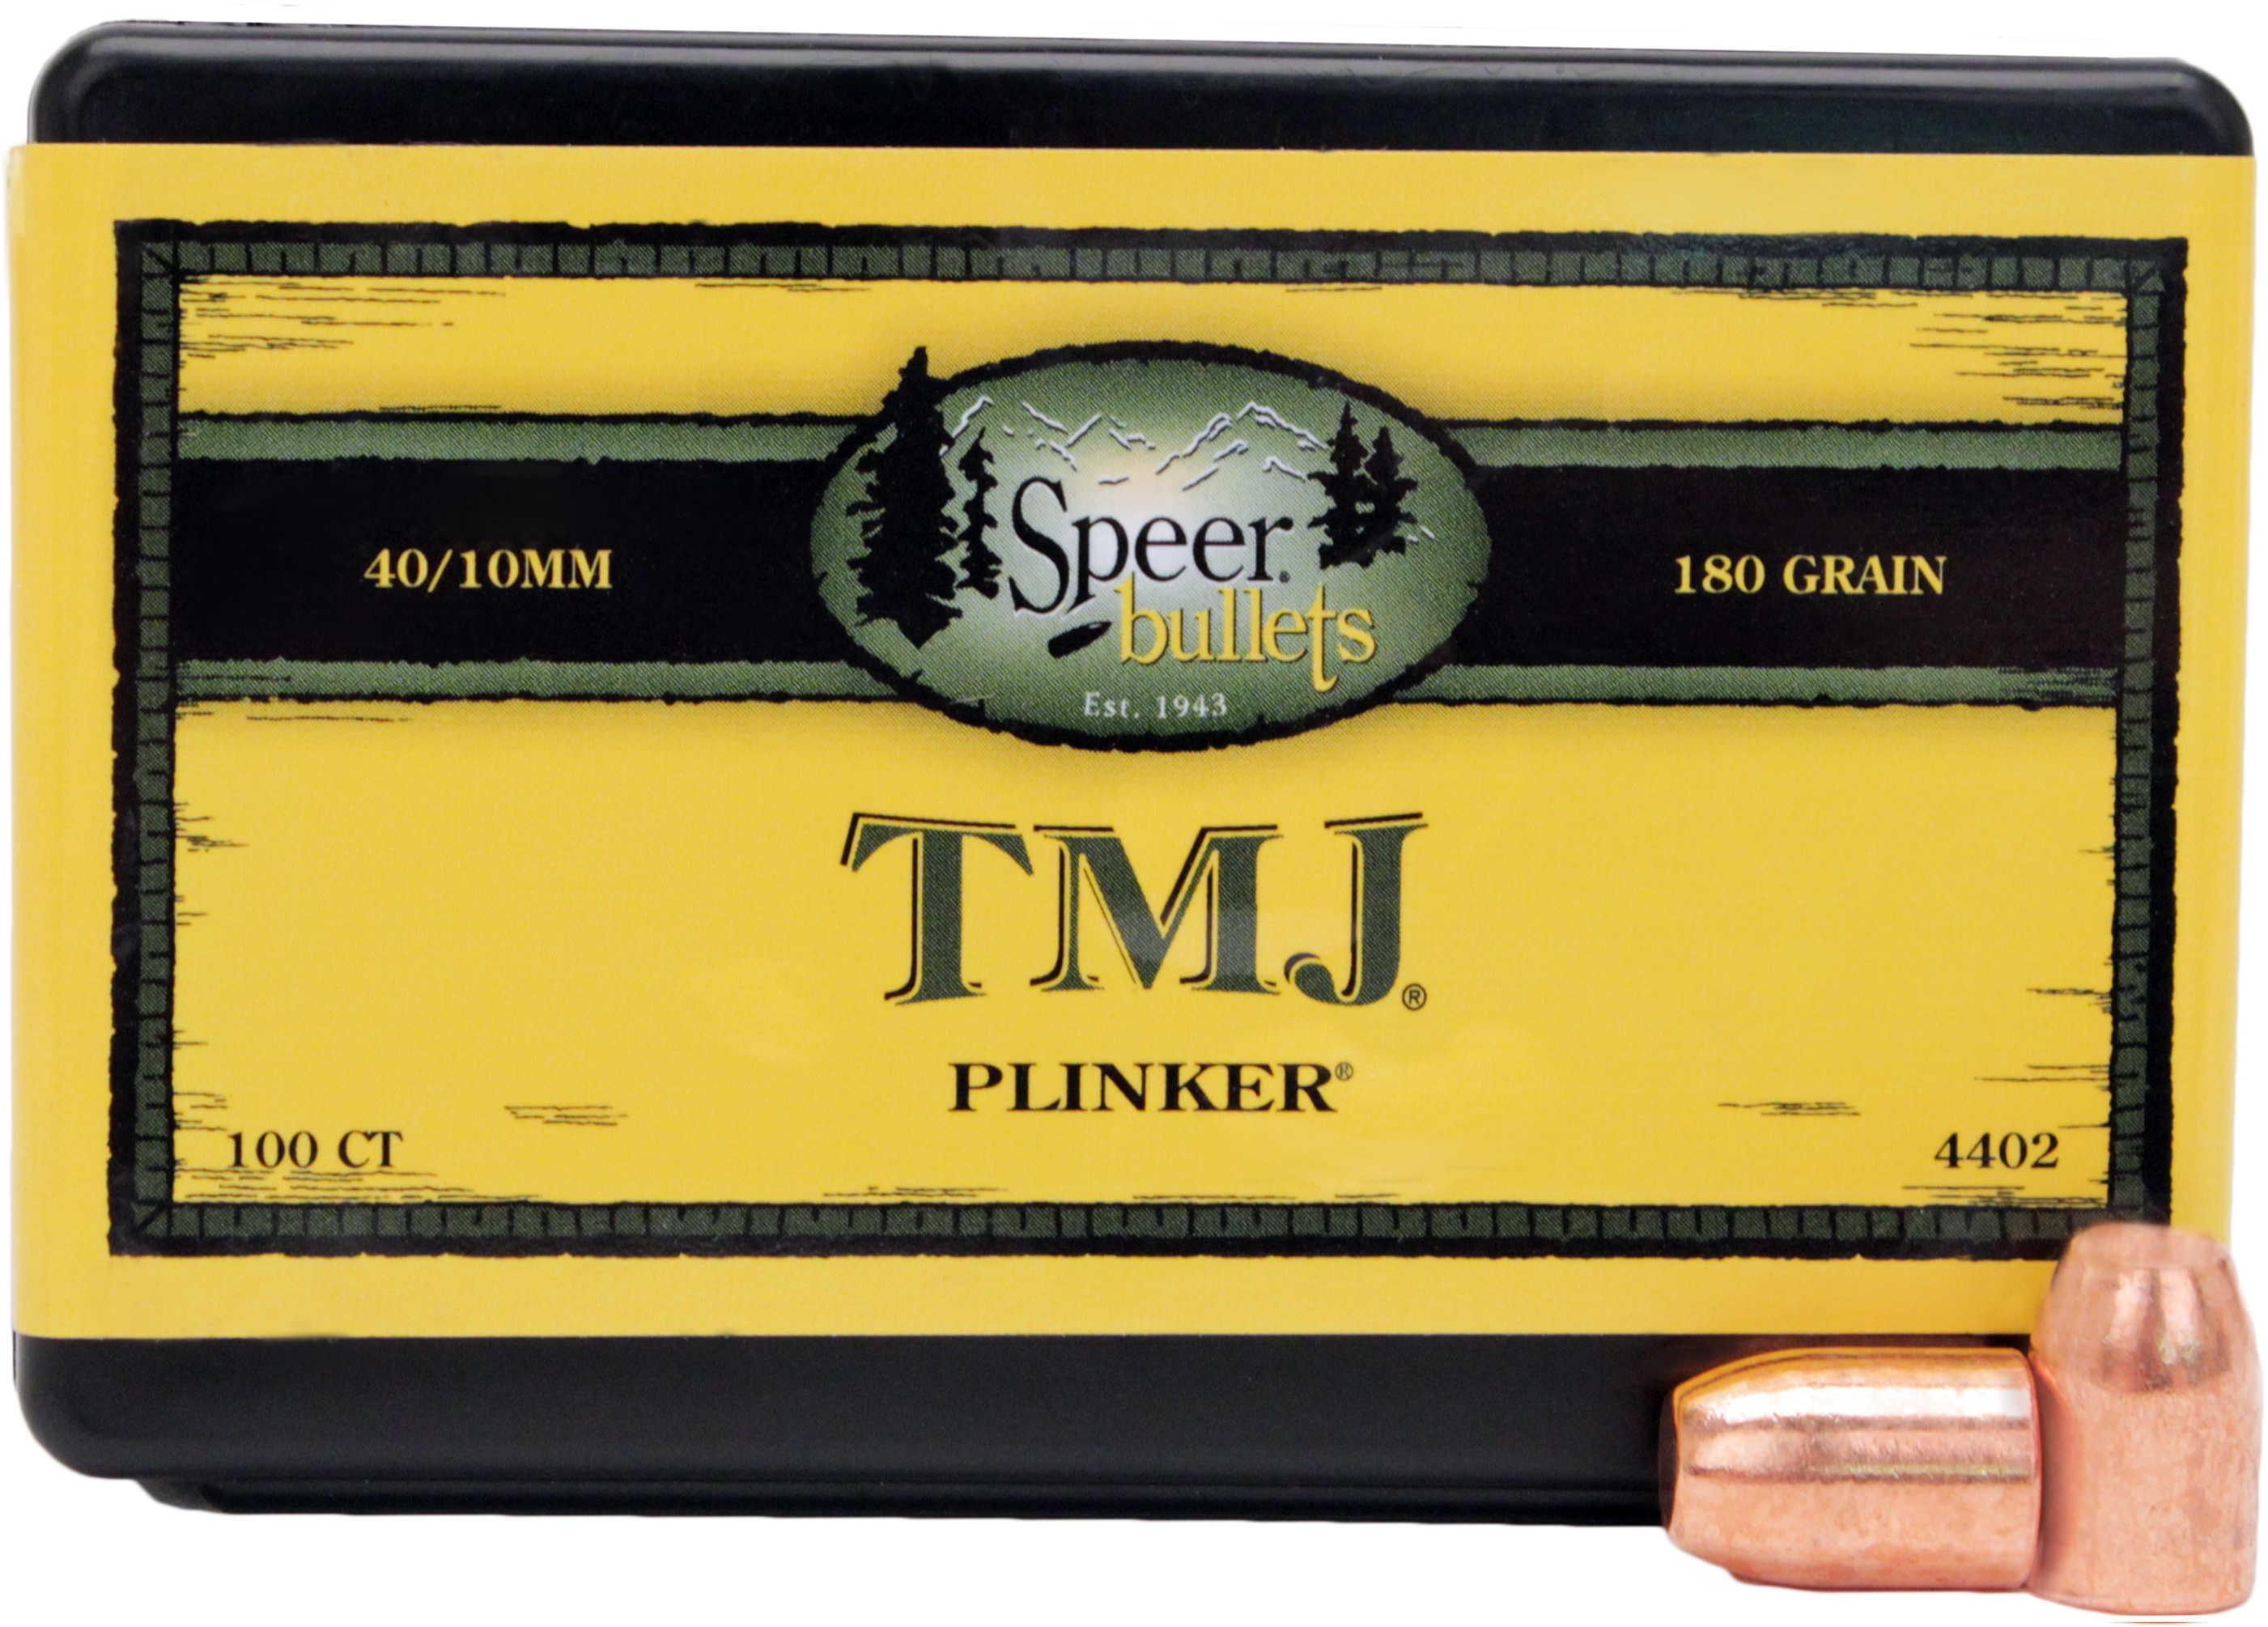 Speer 40/10MM Caliber 180 Grain Encased Uni-Core Full Metal Jacket 100/Box Md: 4402 Bullets